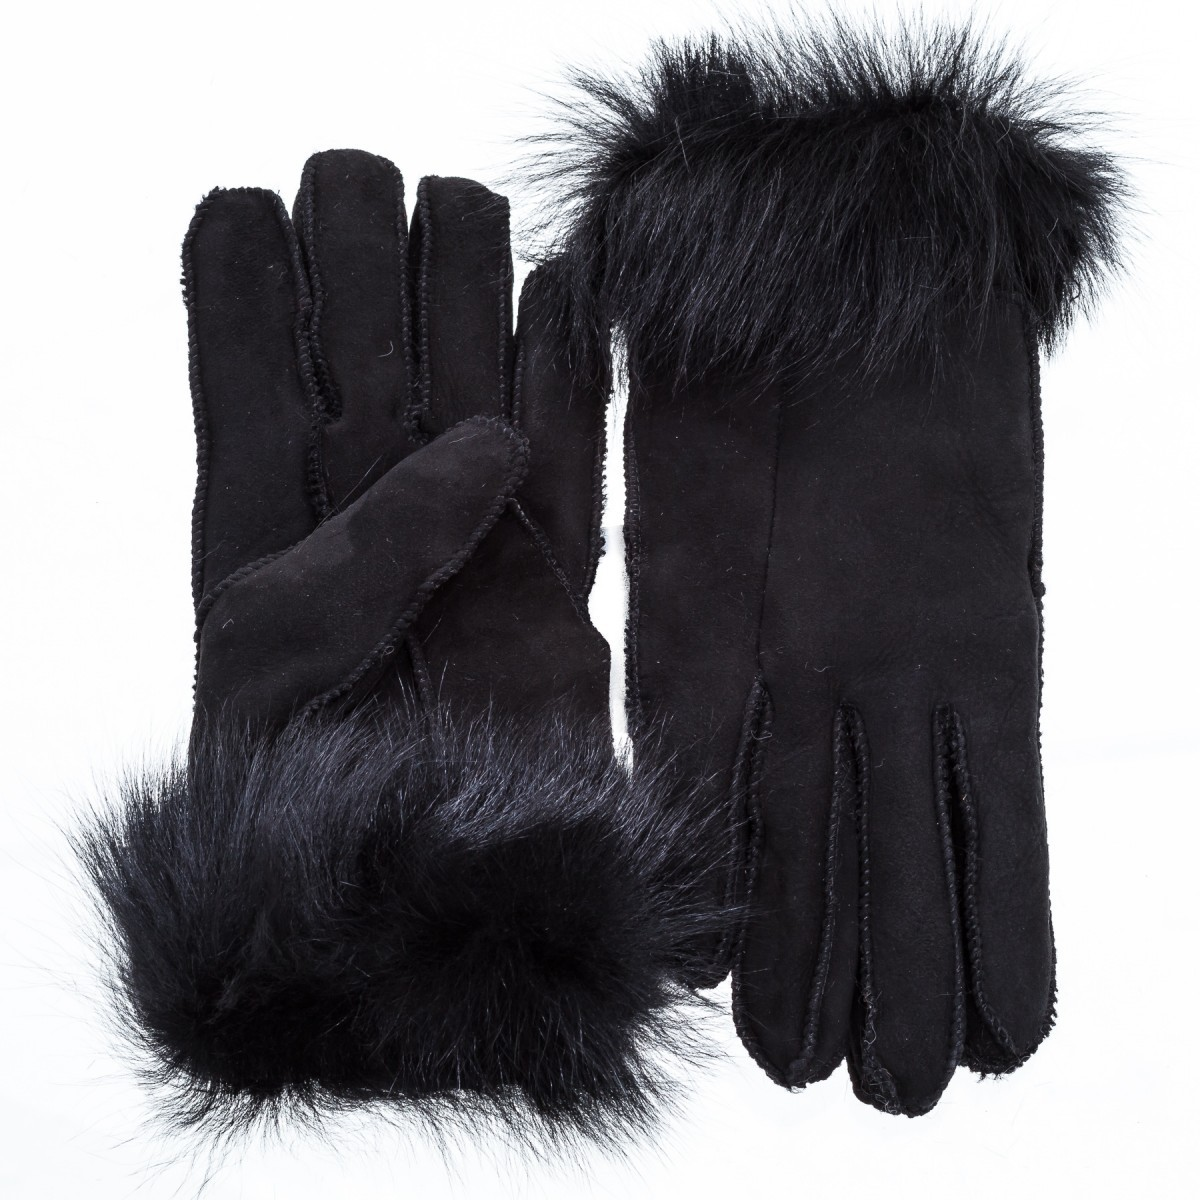 Toscana Cuff - Genuine Toscana Sheepskin Real Fur $100